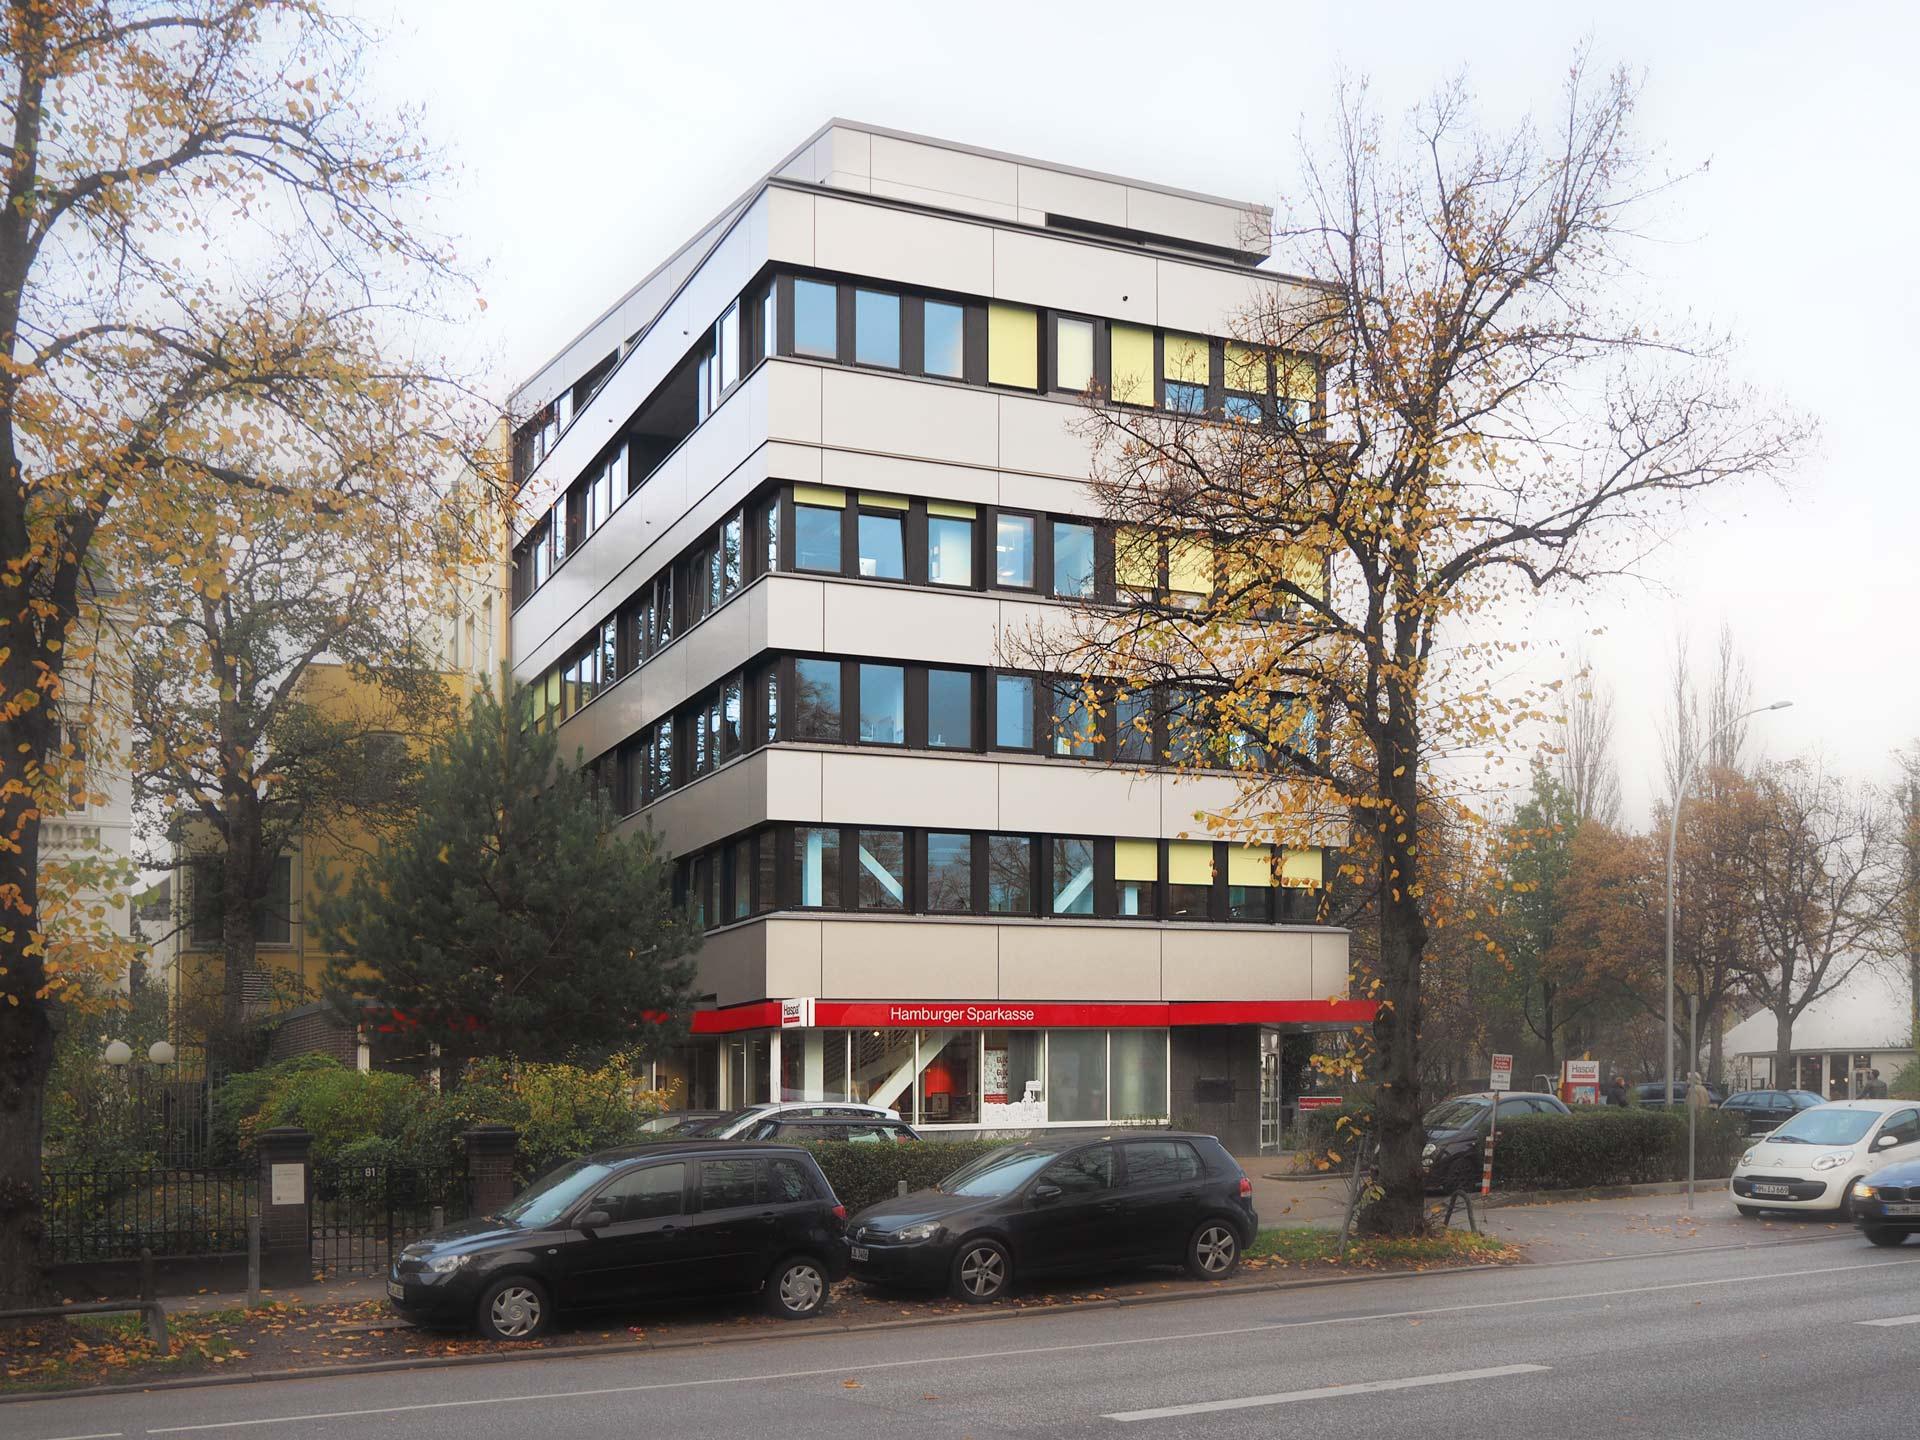 Rothenbaumchaussee - Limbrock Tubbesing Architekten